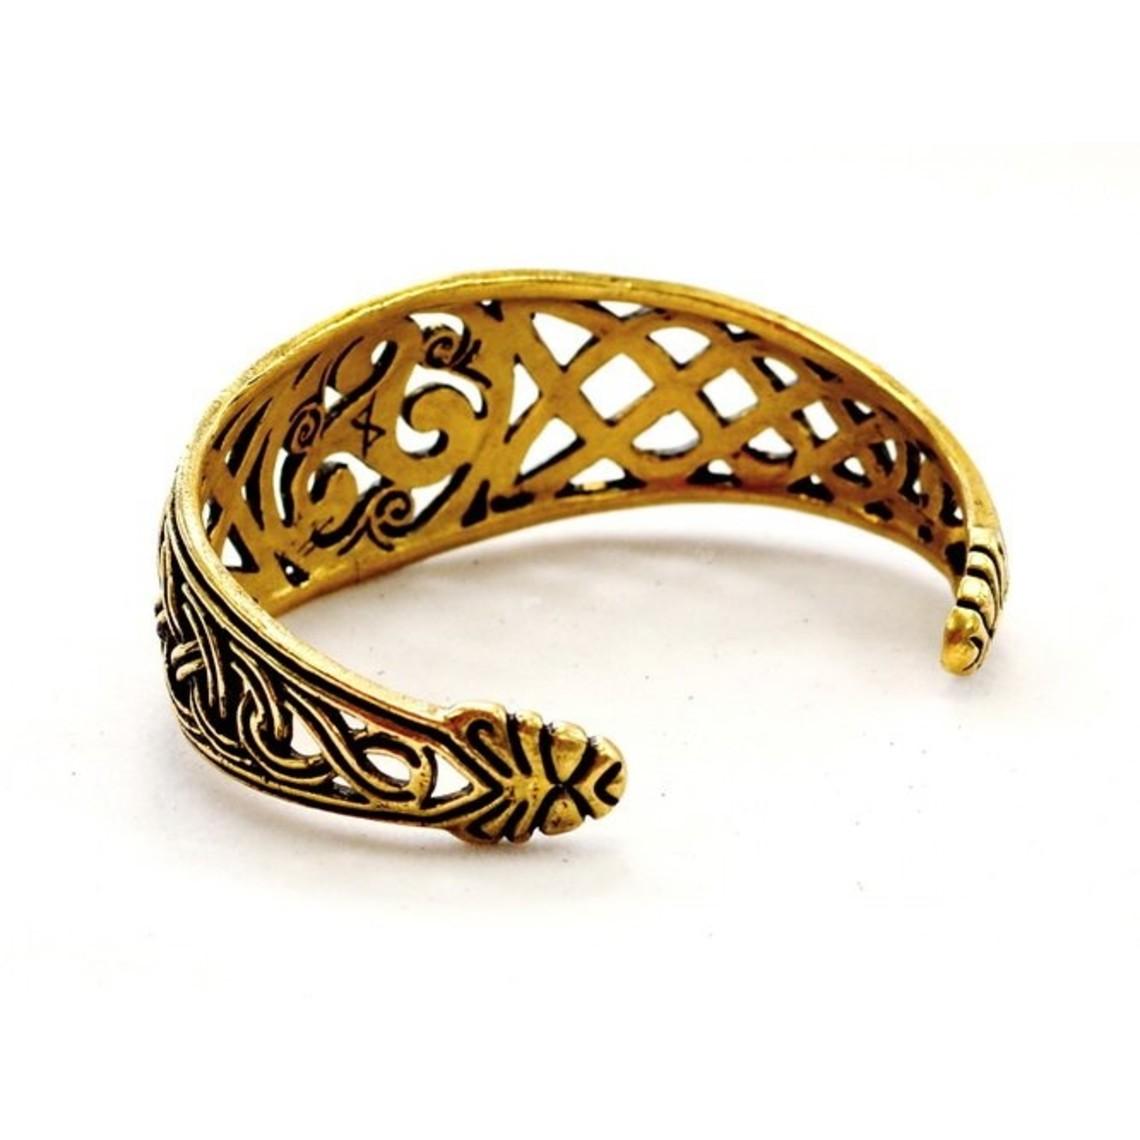 Keltische armband met trisquelion, verzilverd